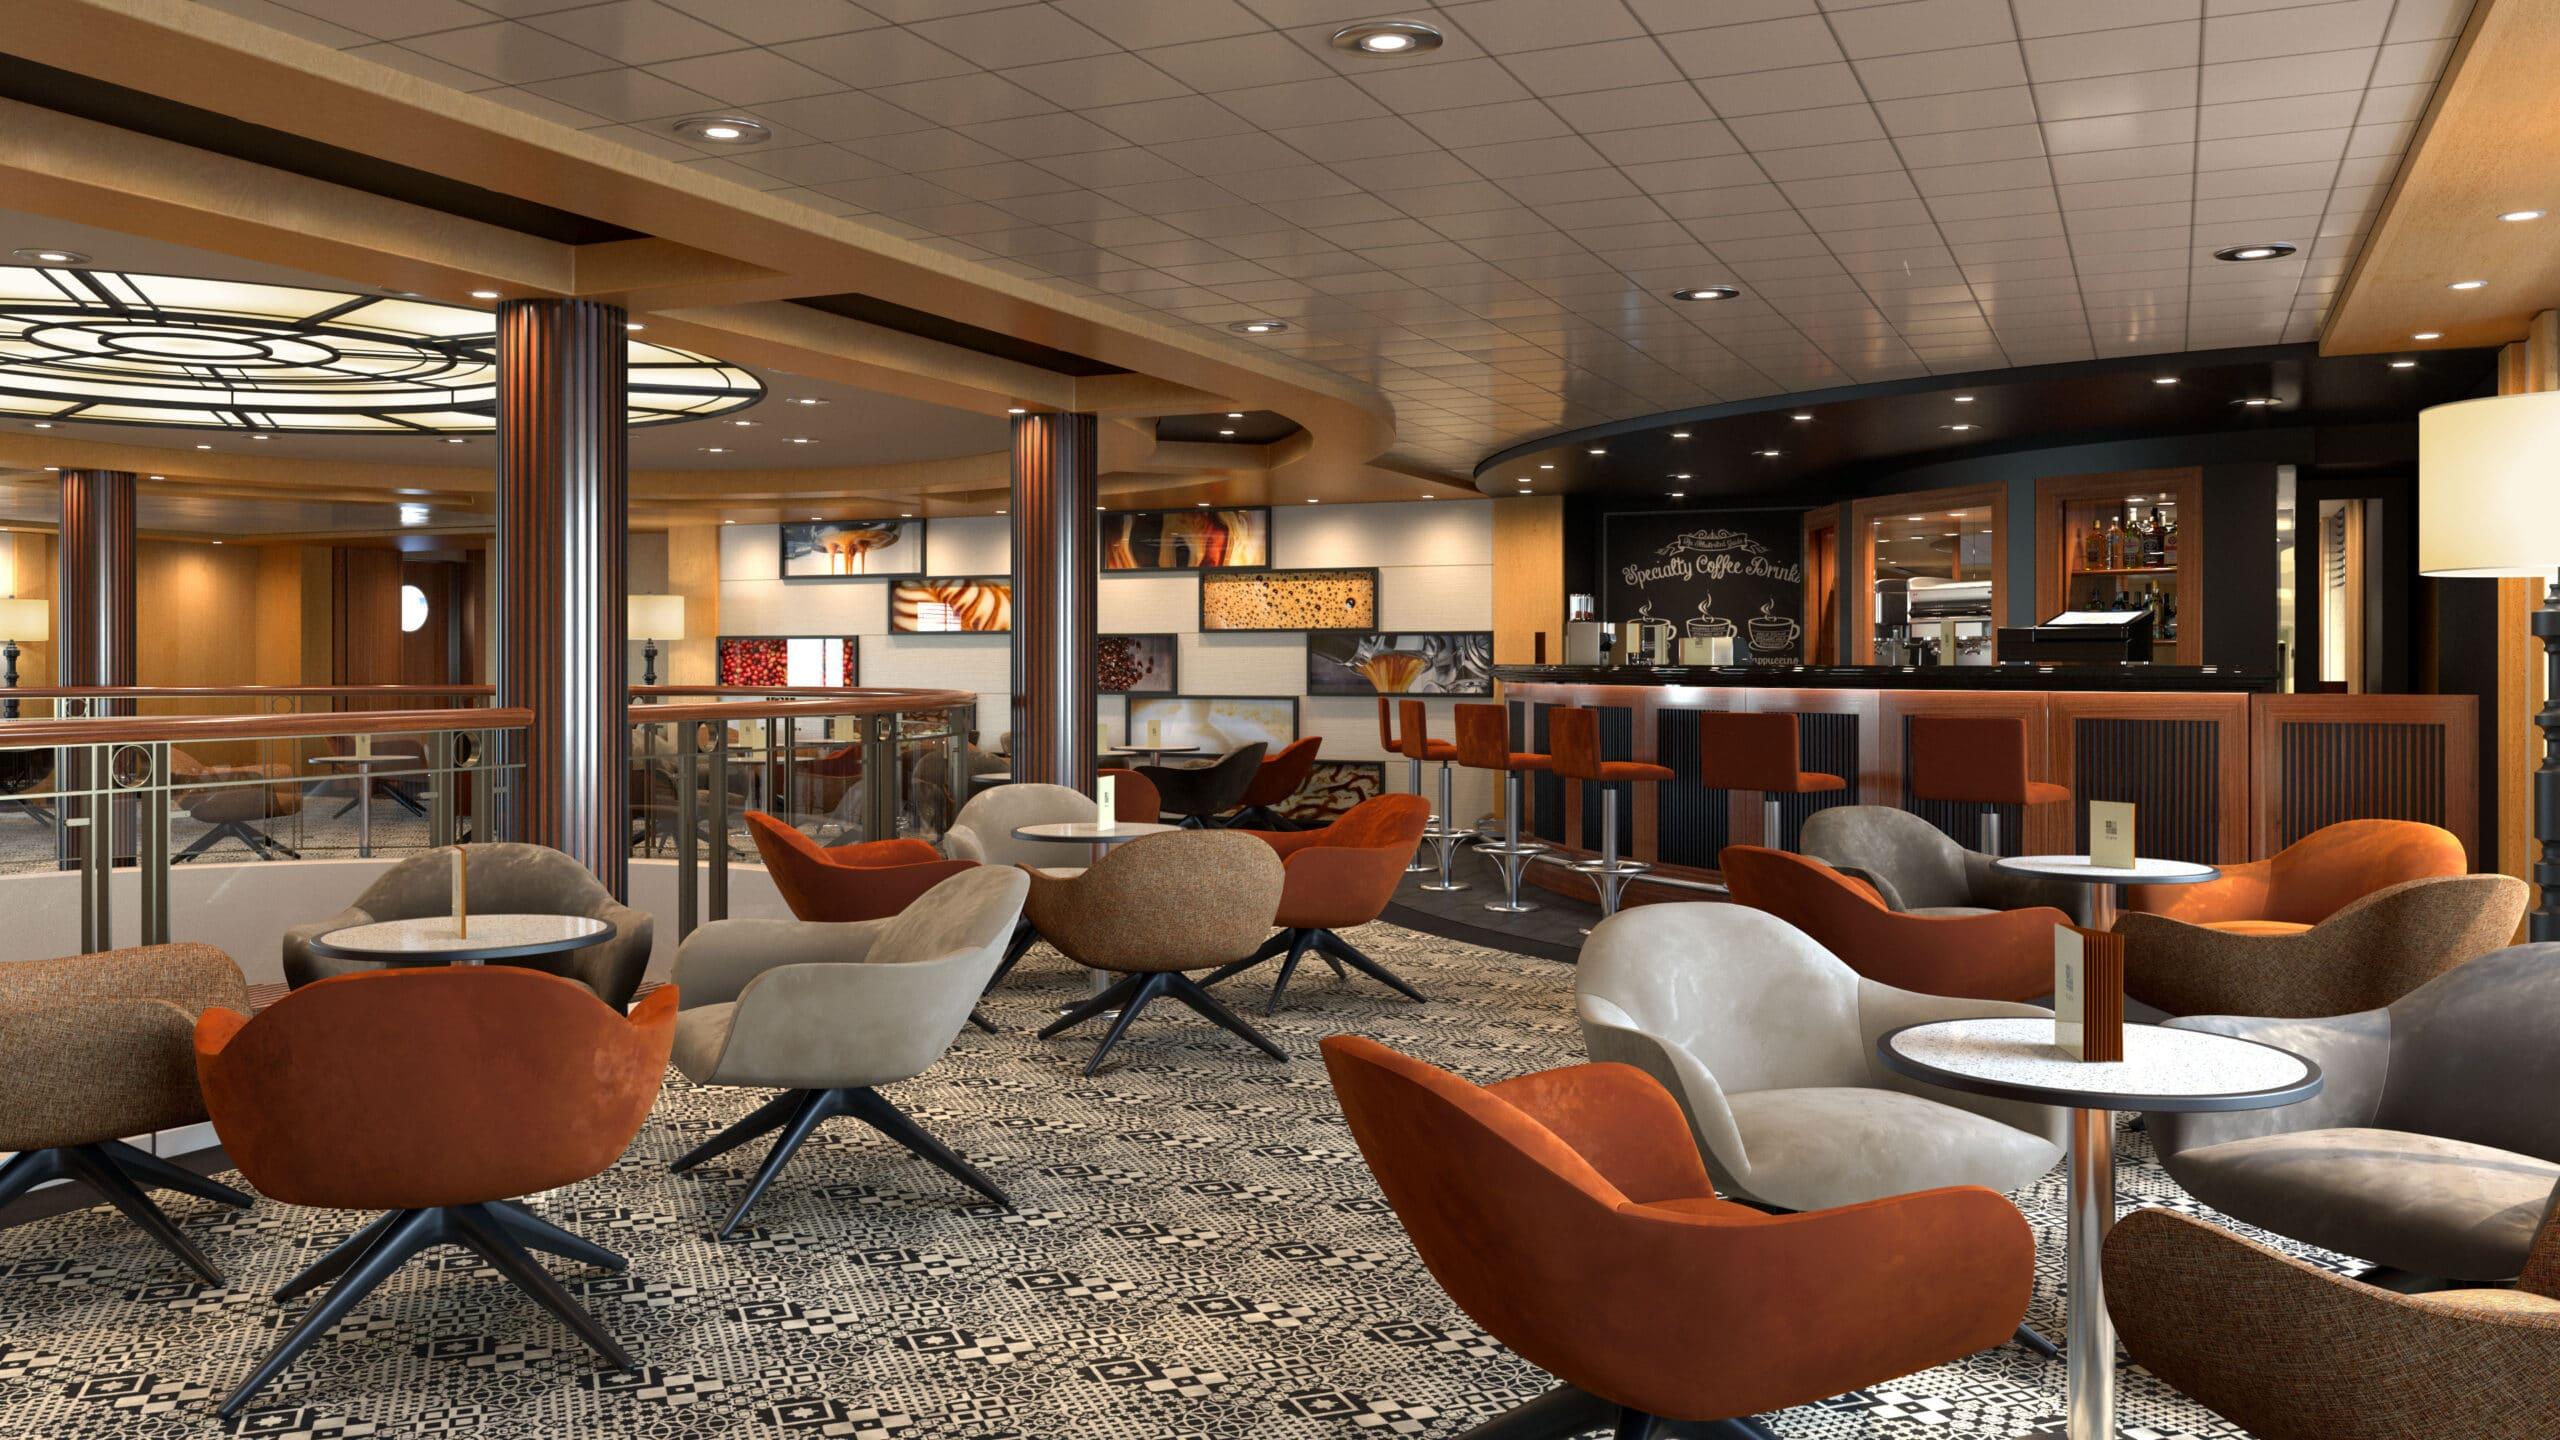 Cruiseschip-AIDAmira-AIDA-Cafe Mare